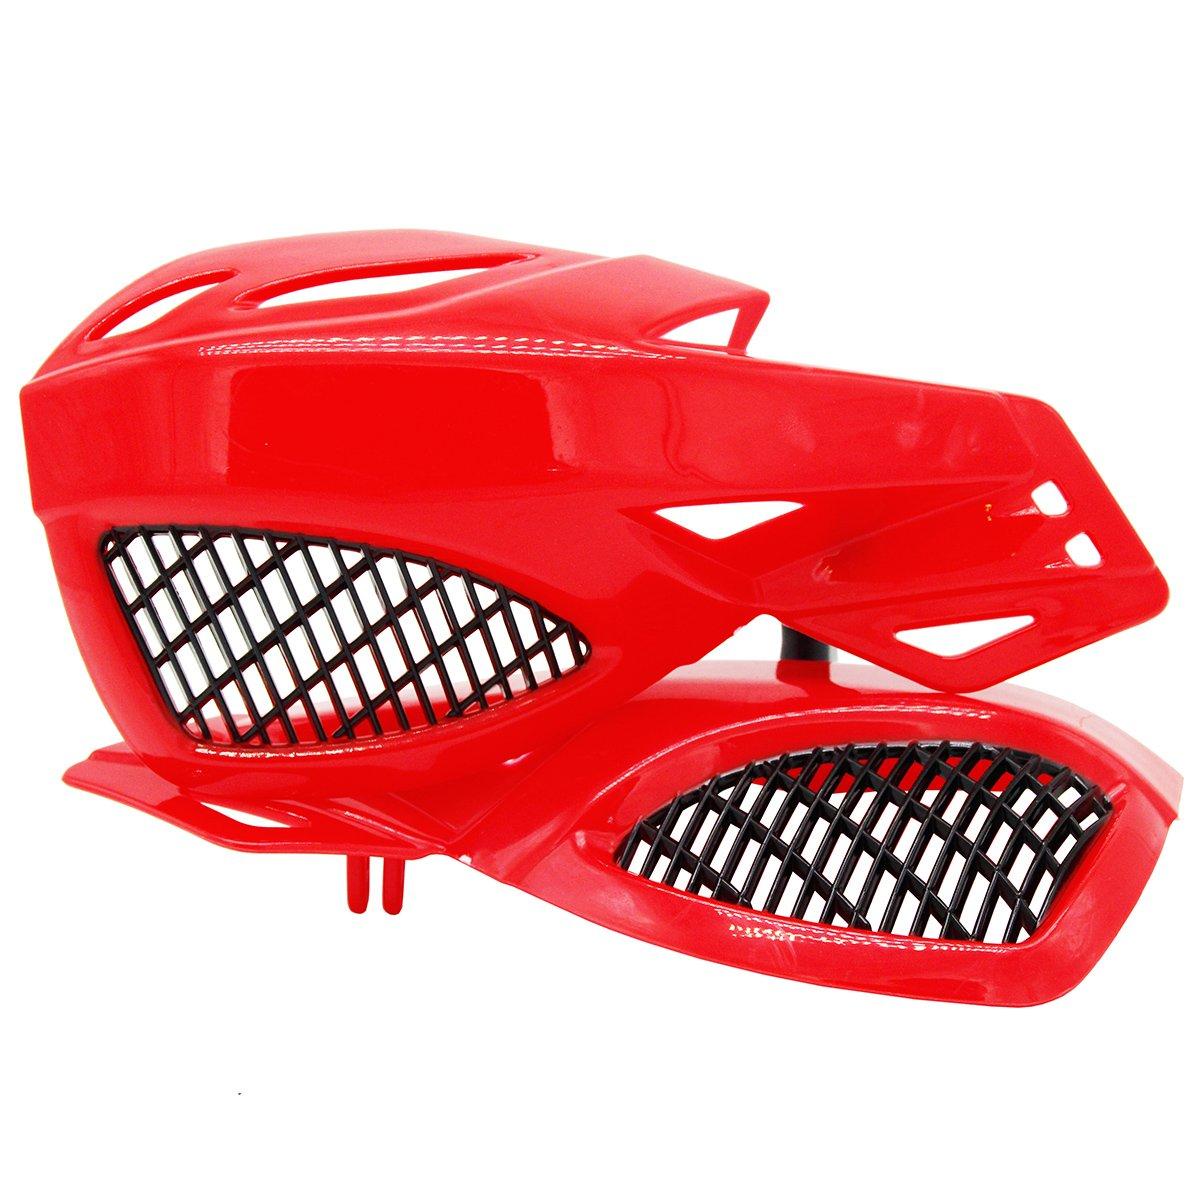 Lozom 7//8 Motorcycle Handguards Handlebar Hand Guards Brush Bar Protector For Motocross Supermoto Racing Dirt Bike ATV White